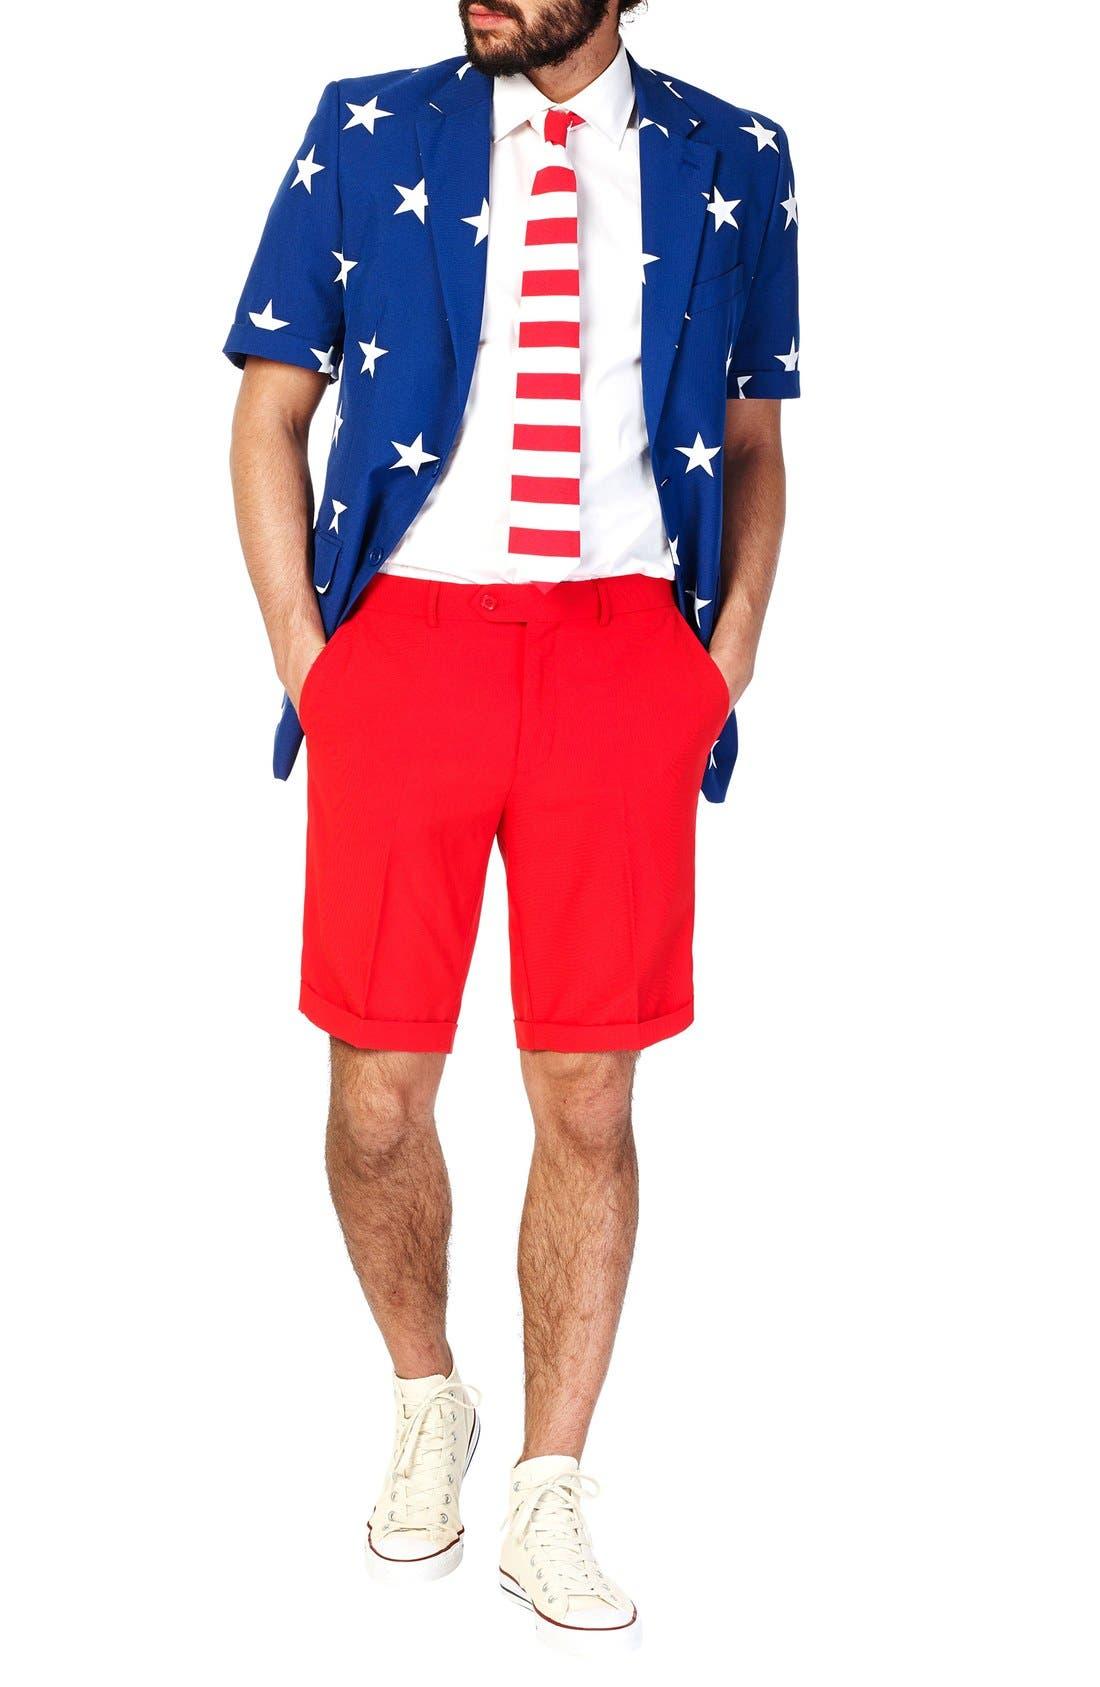 'Summer Stars & Stripes' Trim Fit Short Suit with Tie,                             Main thumbnail 1, color,                             400